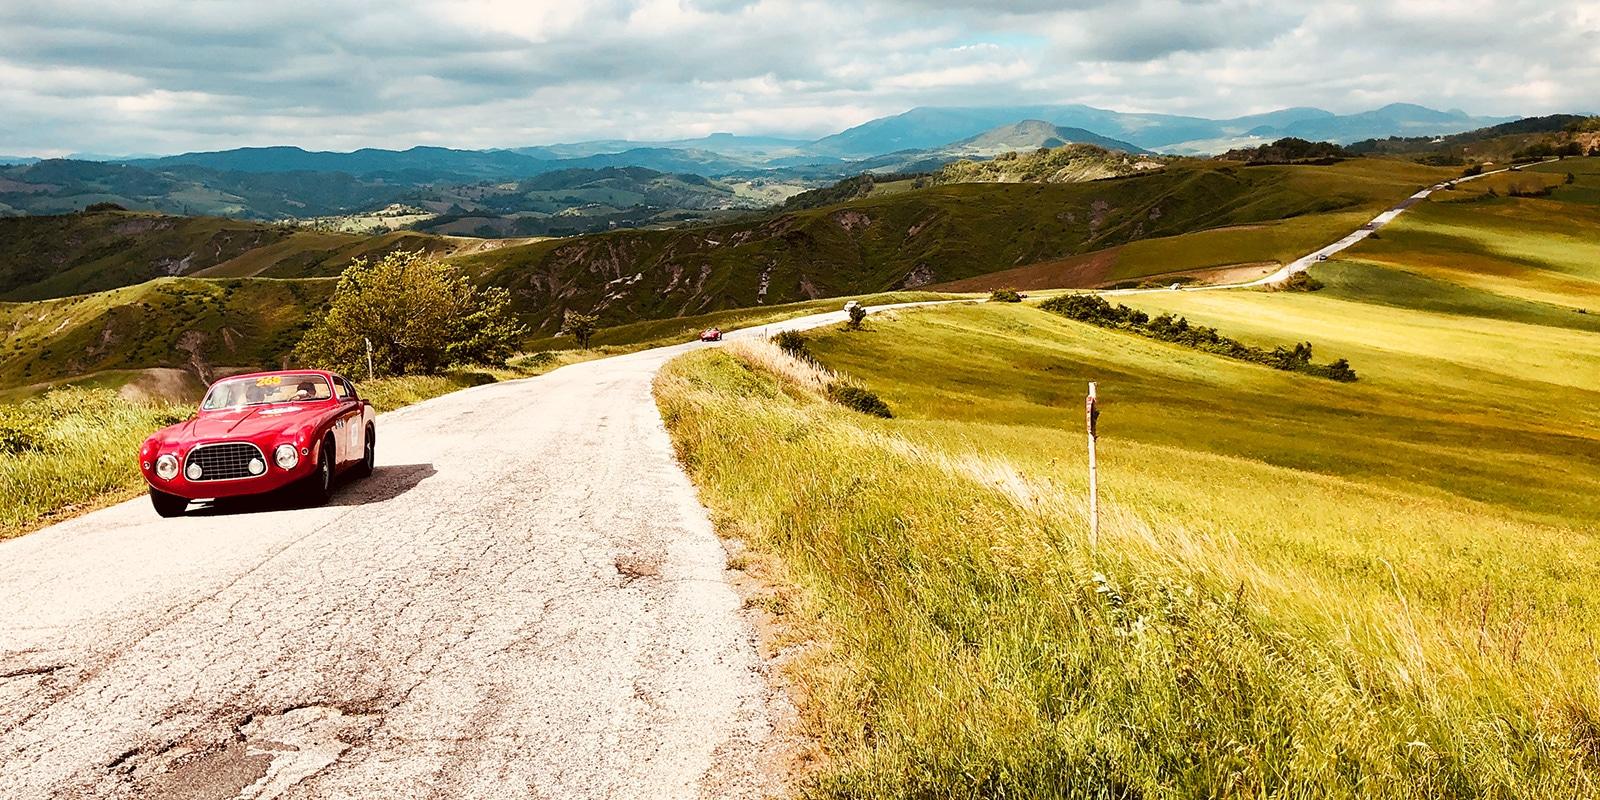 Mille Miglia 2019 Toscana-Hügel